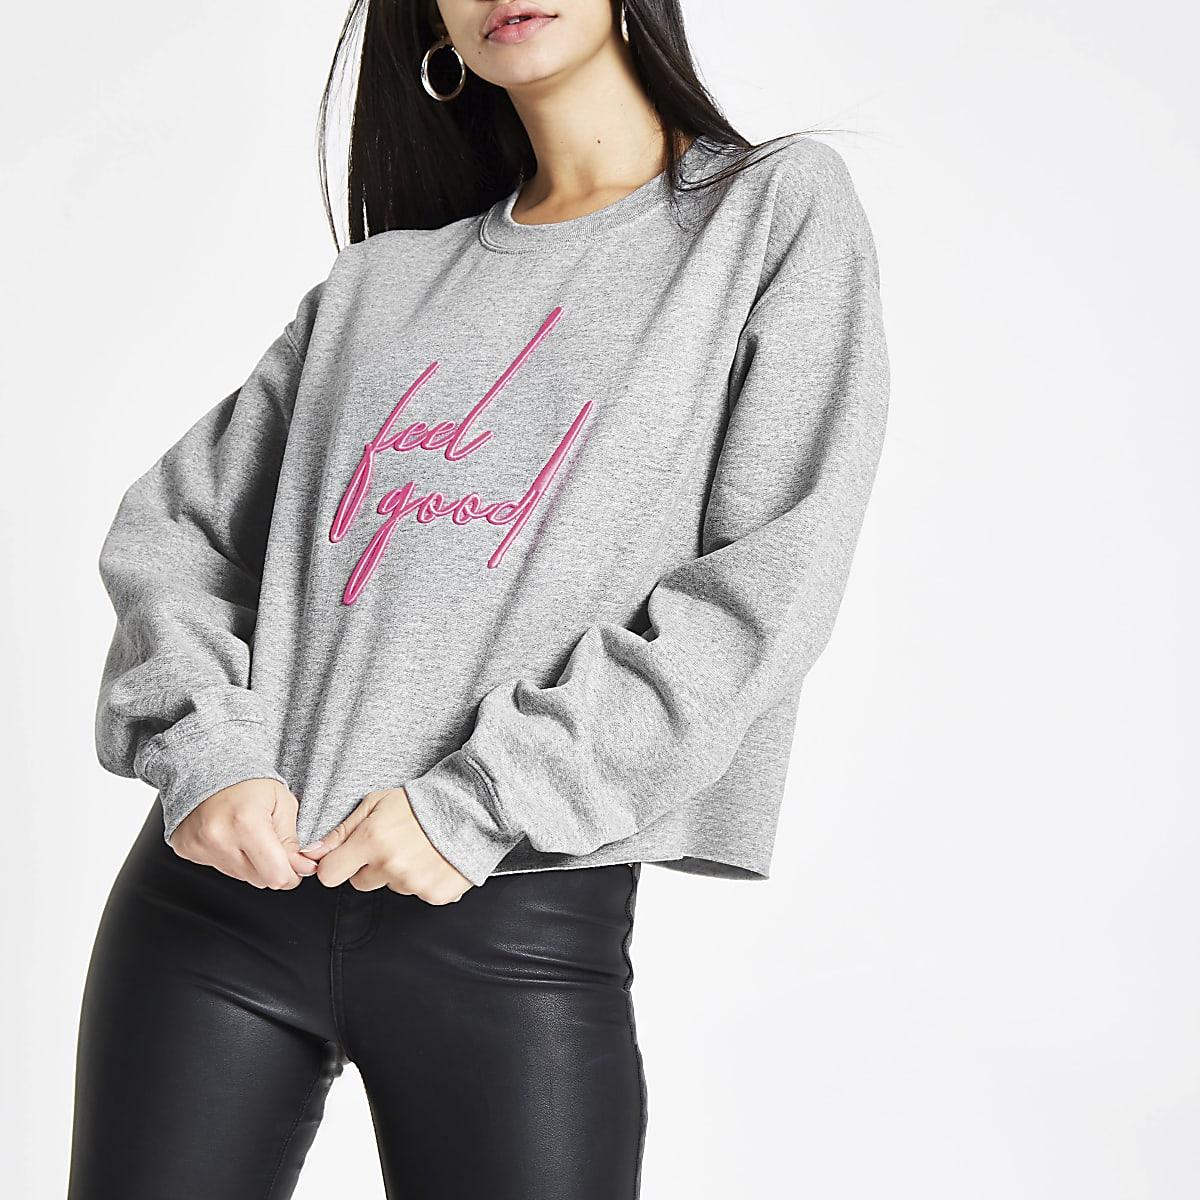 Grey 'feel good' embroidered sweatshirt